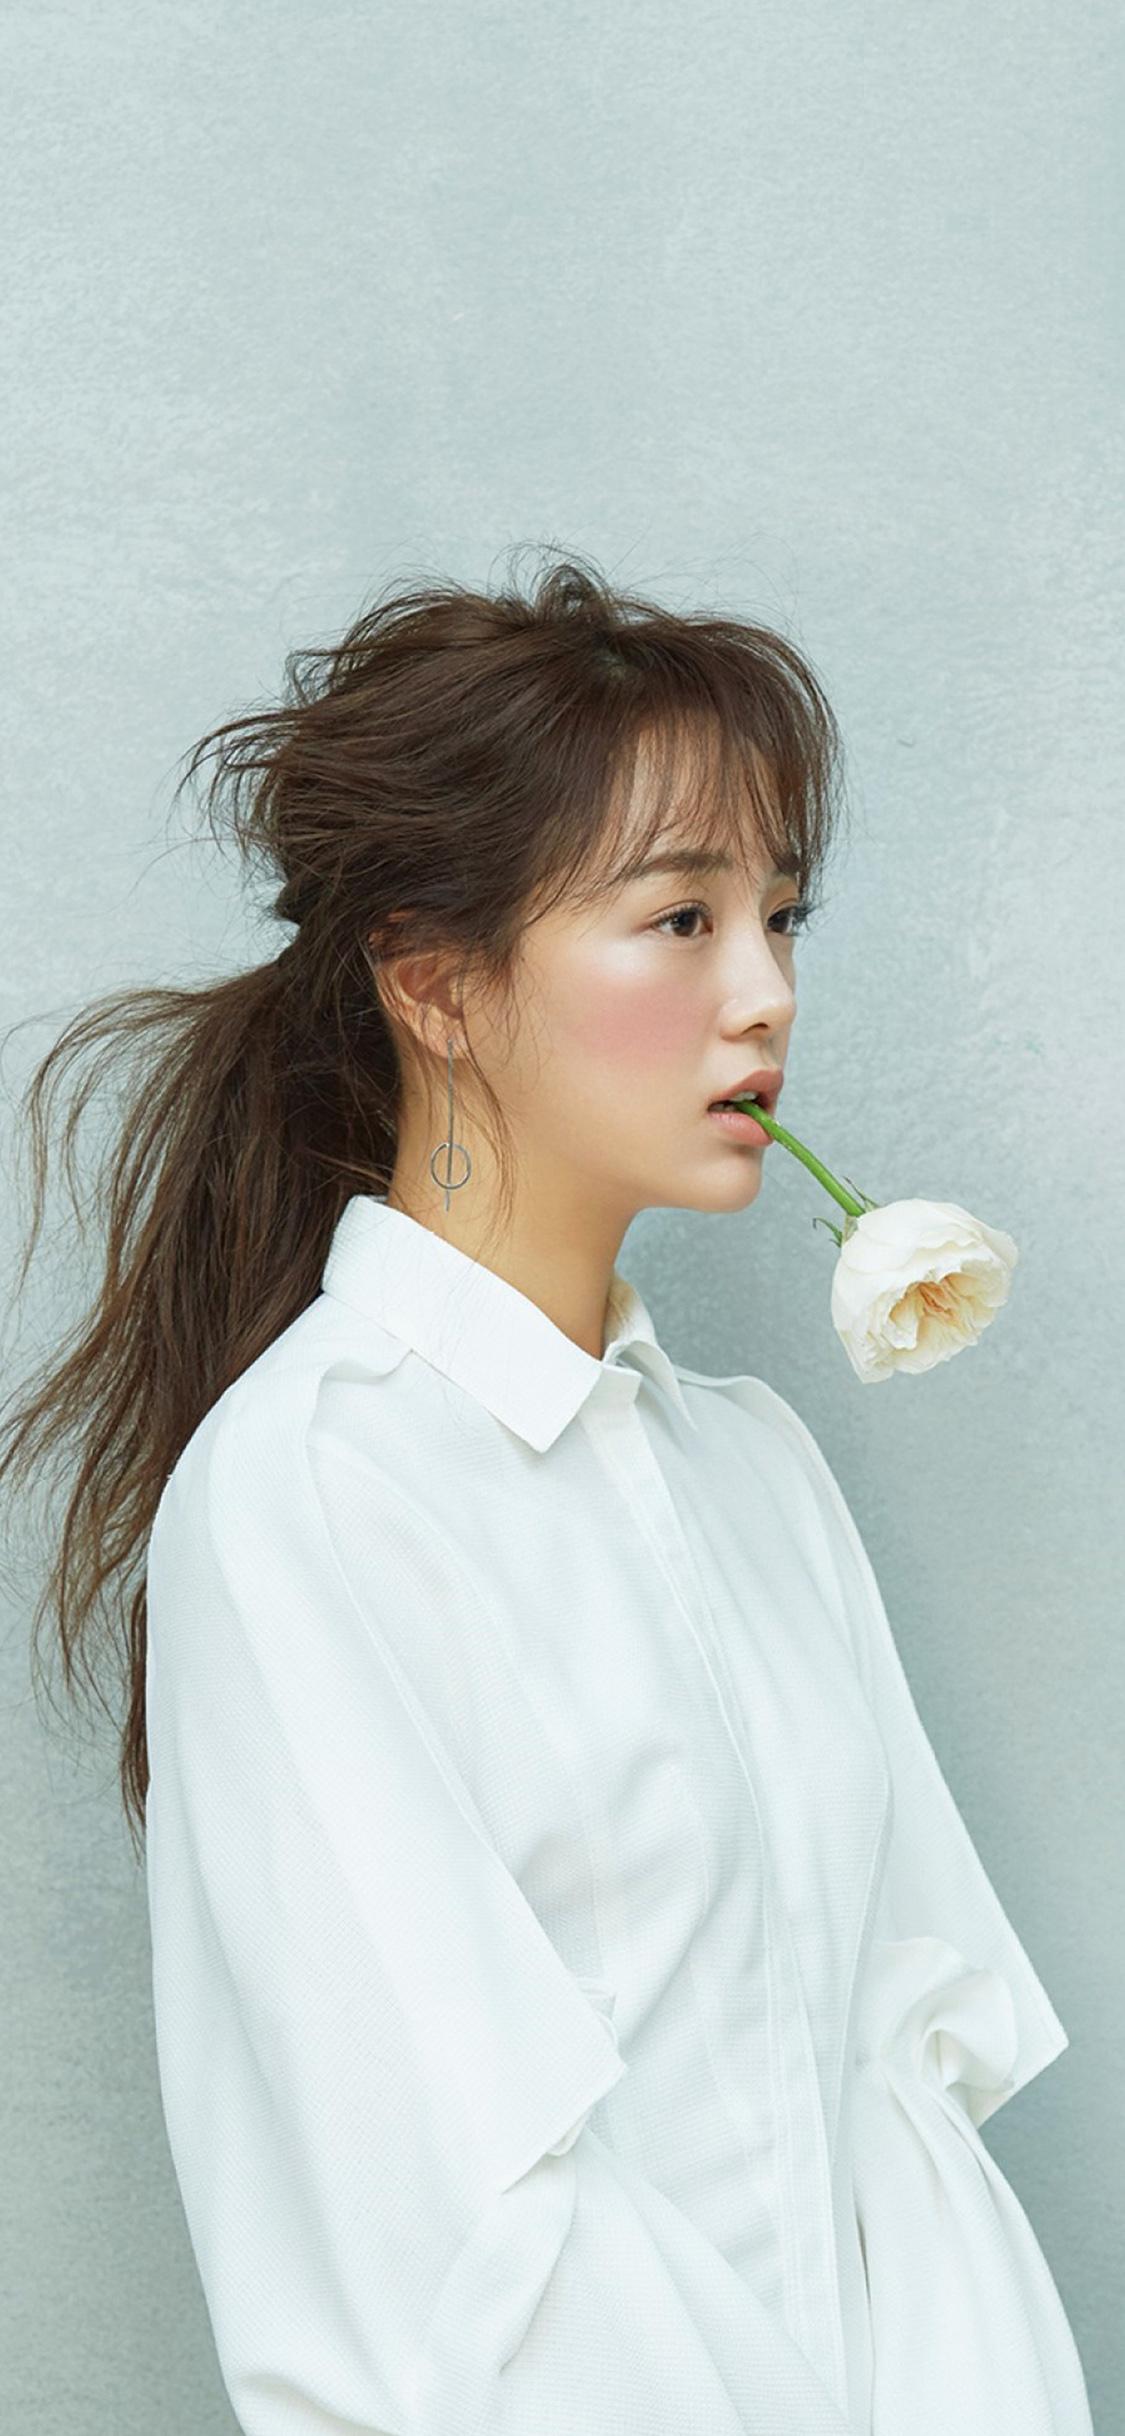 iPhoneXpapers.com-Apple-iPhone-wallpaper-hl69-kpop-sejung-ioi-girl-cute-blush